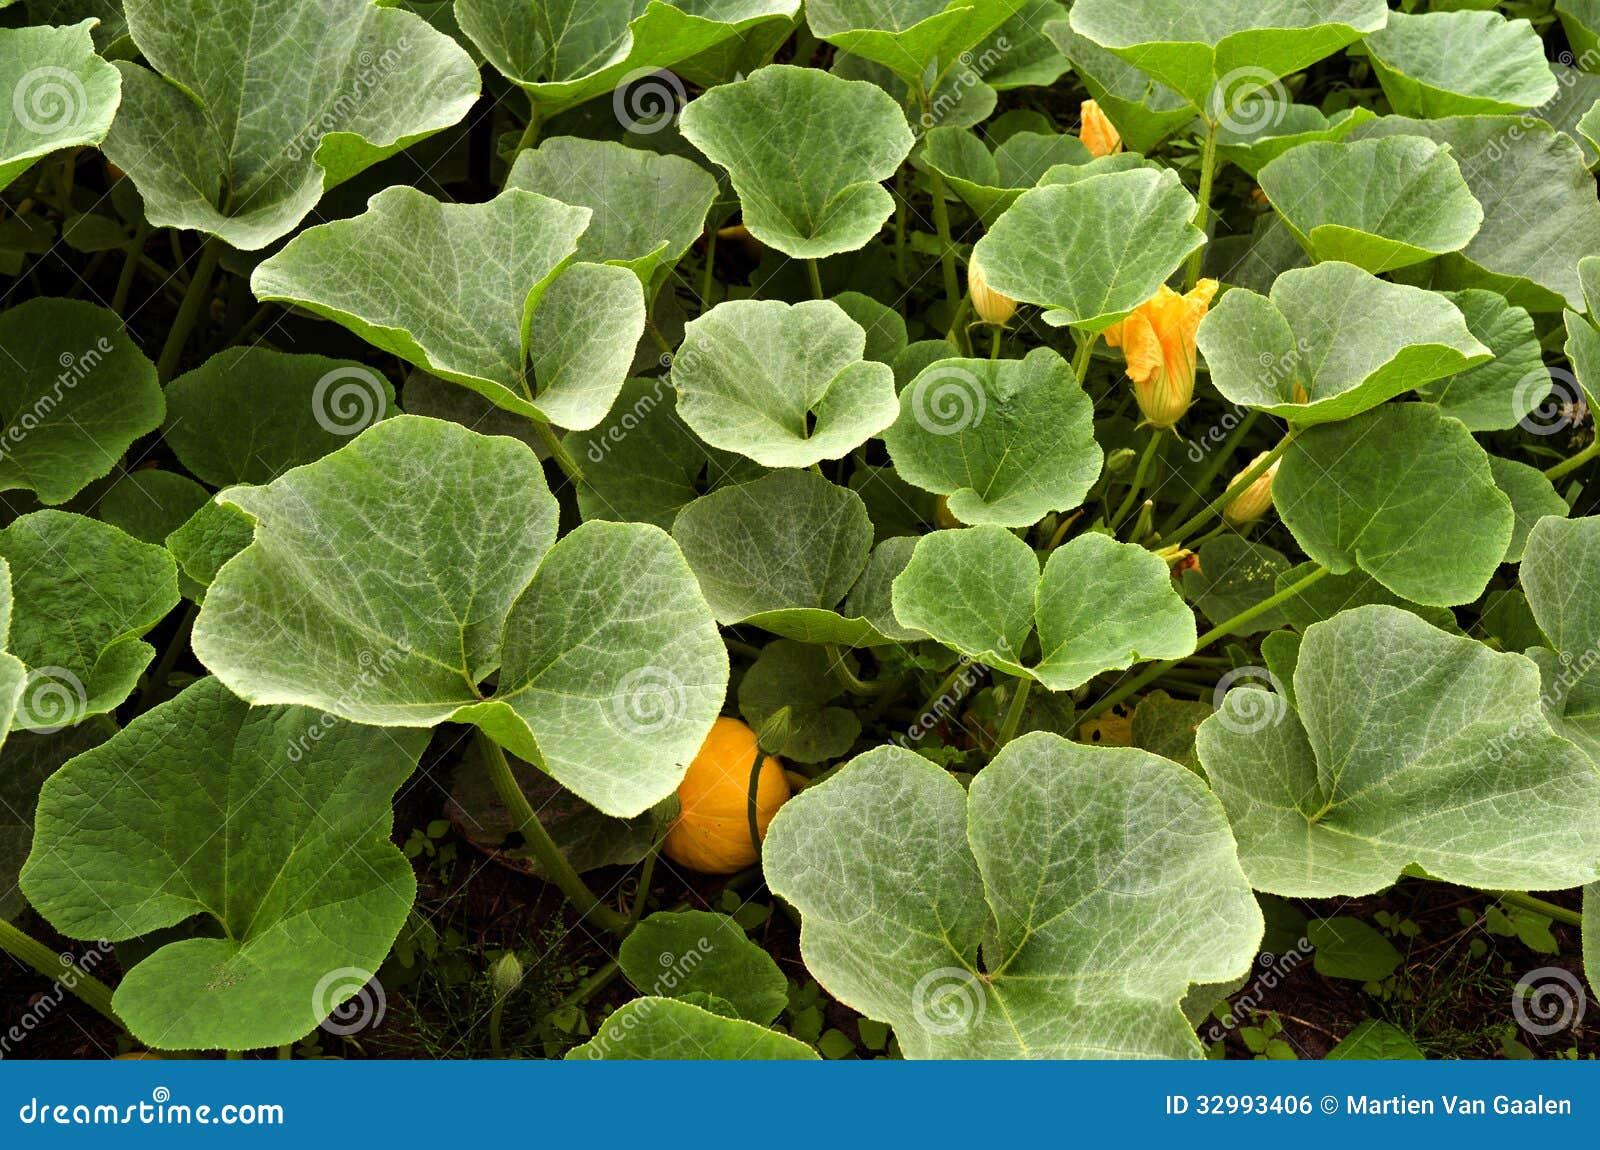 Pumpkin plants in the organic vegetable garden stock for Dream plants for the natural garden